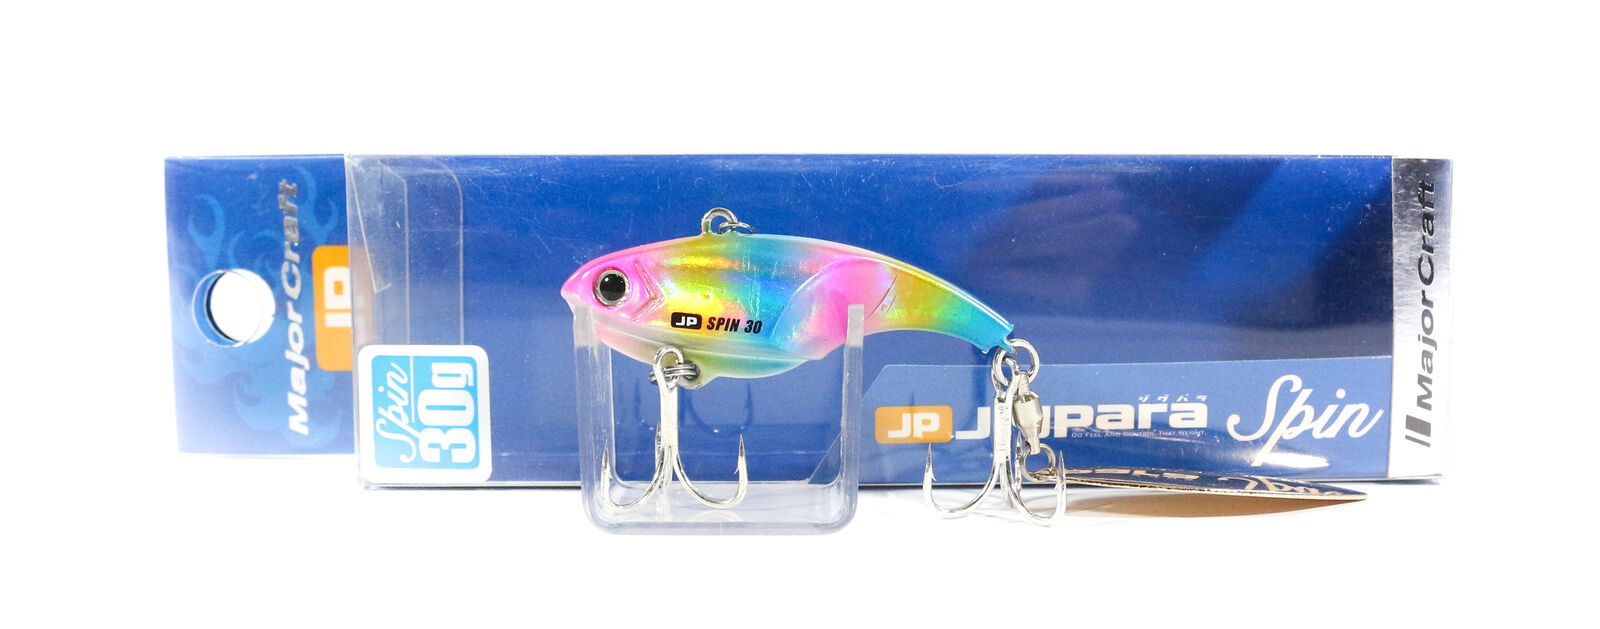 Major craft lure metal jig Jigupara spin 30g # 34 cotton candy JPSPIN-30g